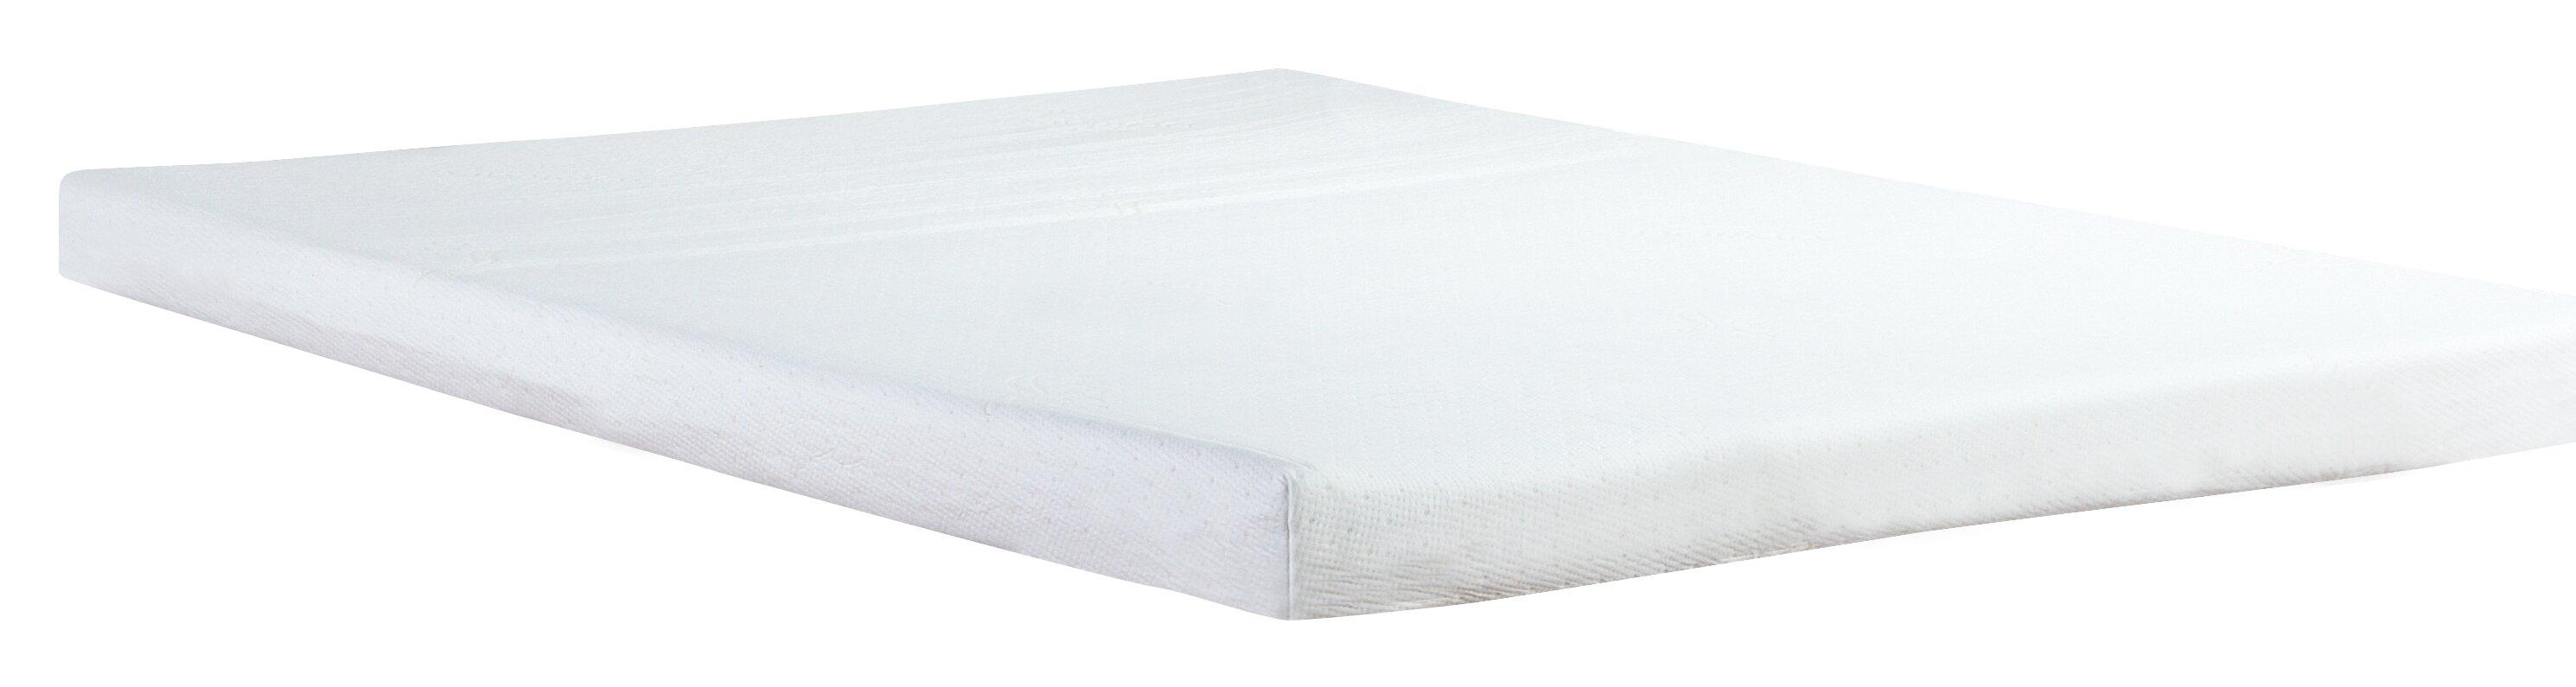 "Classic Brands 4 5"" Plush Memory Foam Mattress & Reviews"